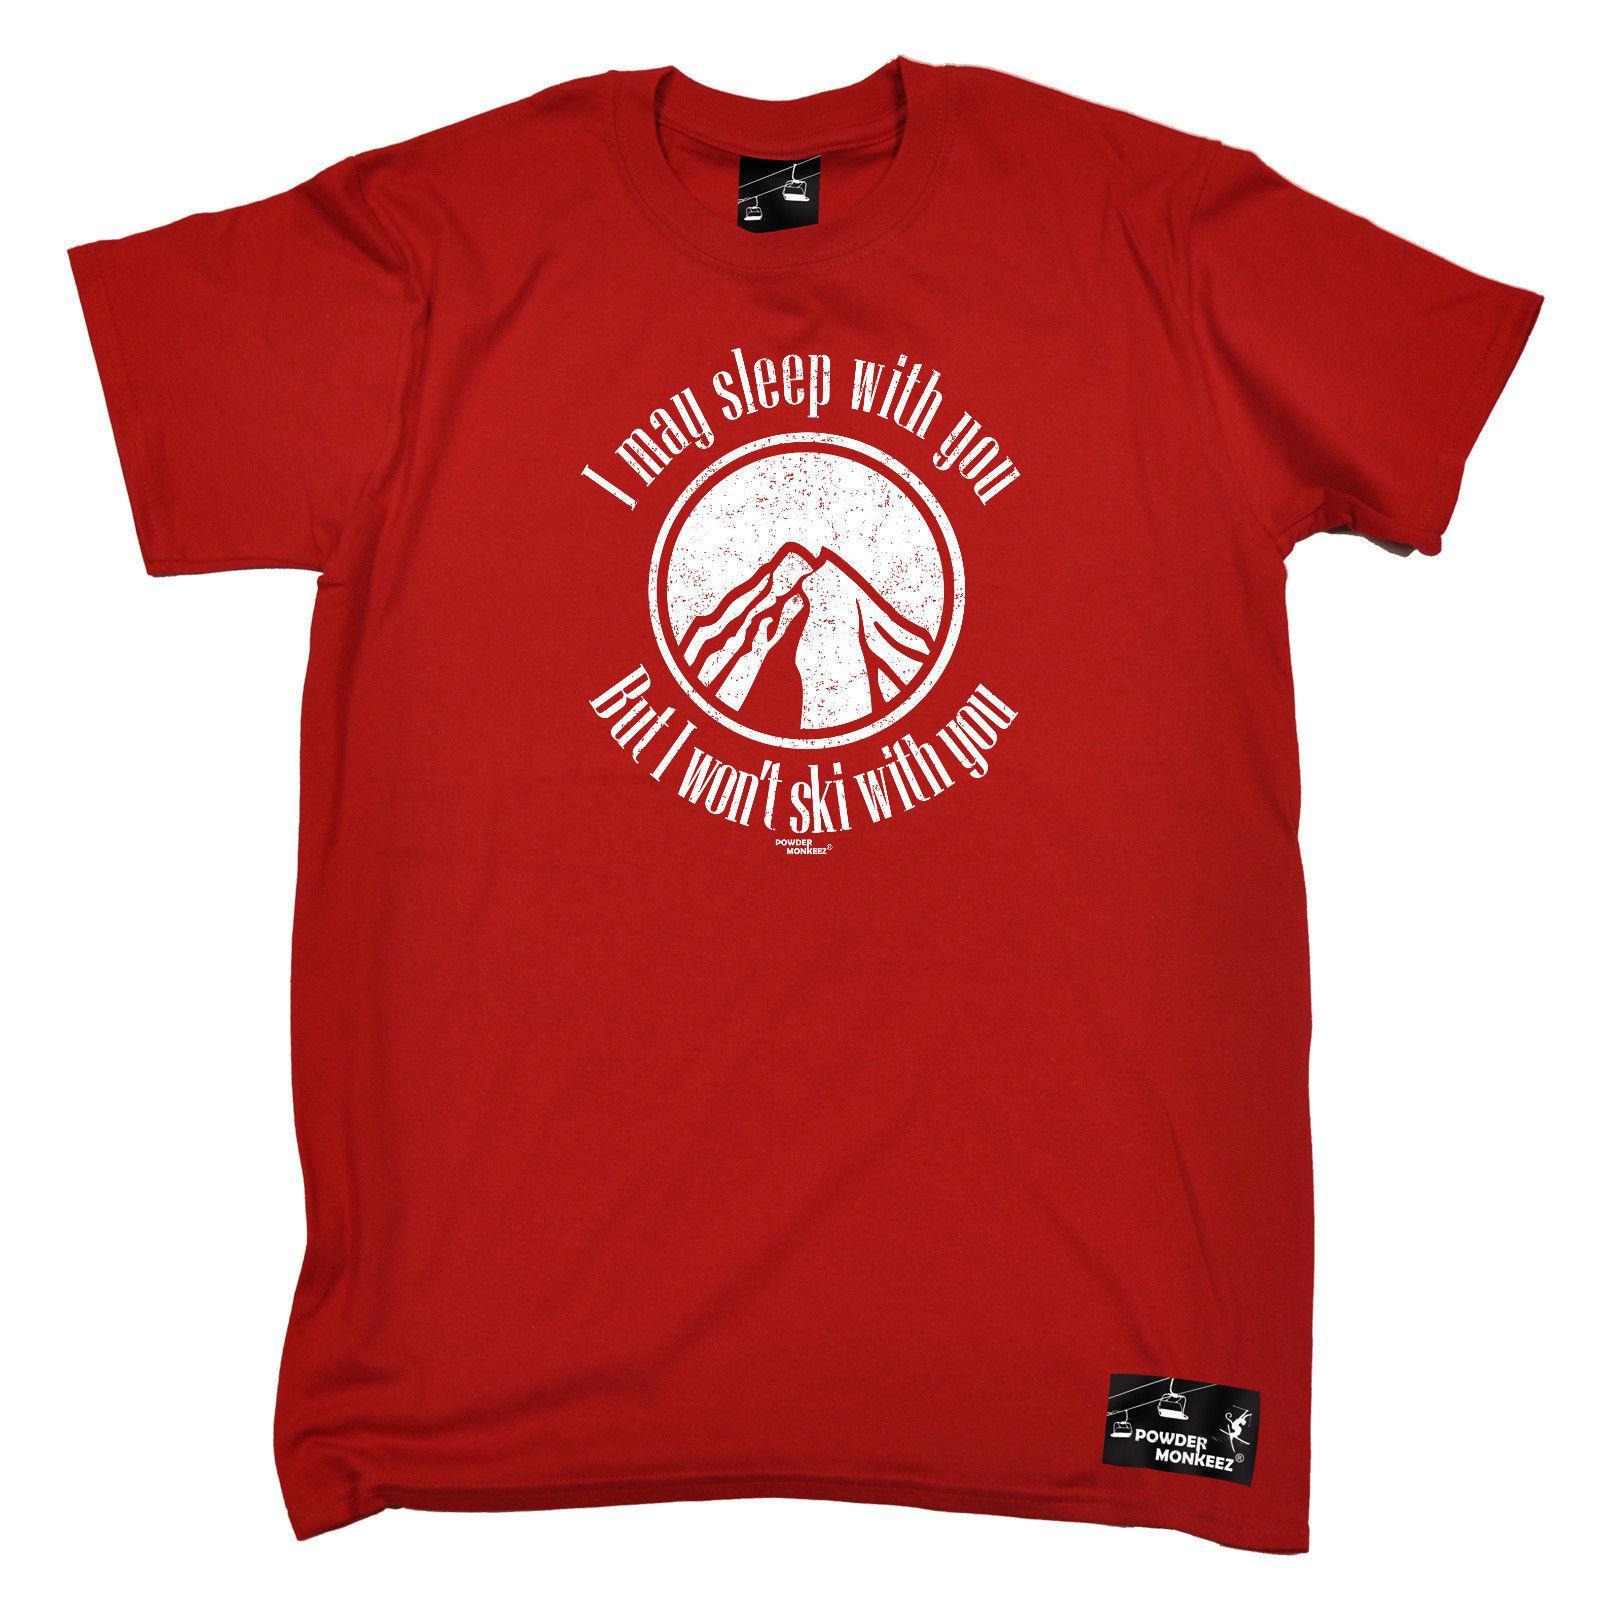 38e6d12ef6 Skiing T Shirt Funny Novelty Mens Tee TShirt Ski I May Sleep With Men Women  Unisex Fashion Tshirt Shirts Design Online T Shirts From Besttshirts201804,  ...